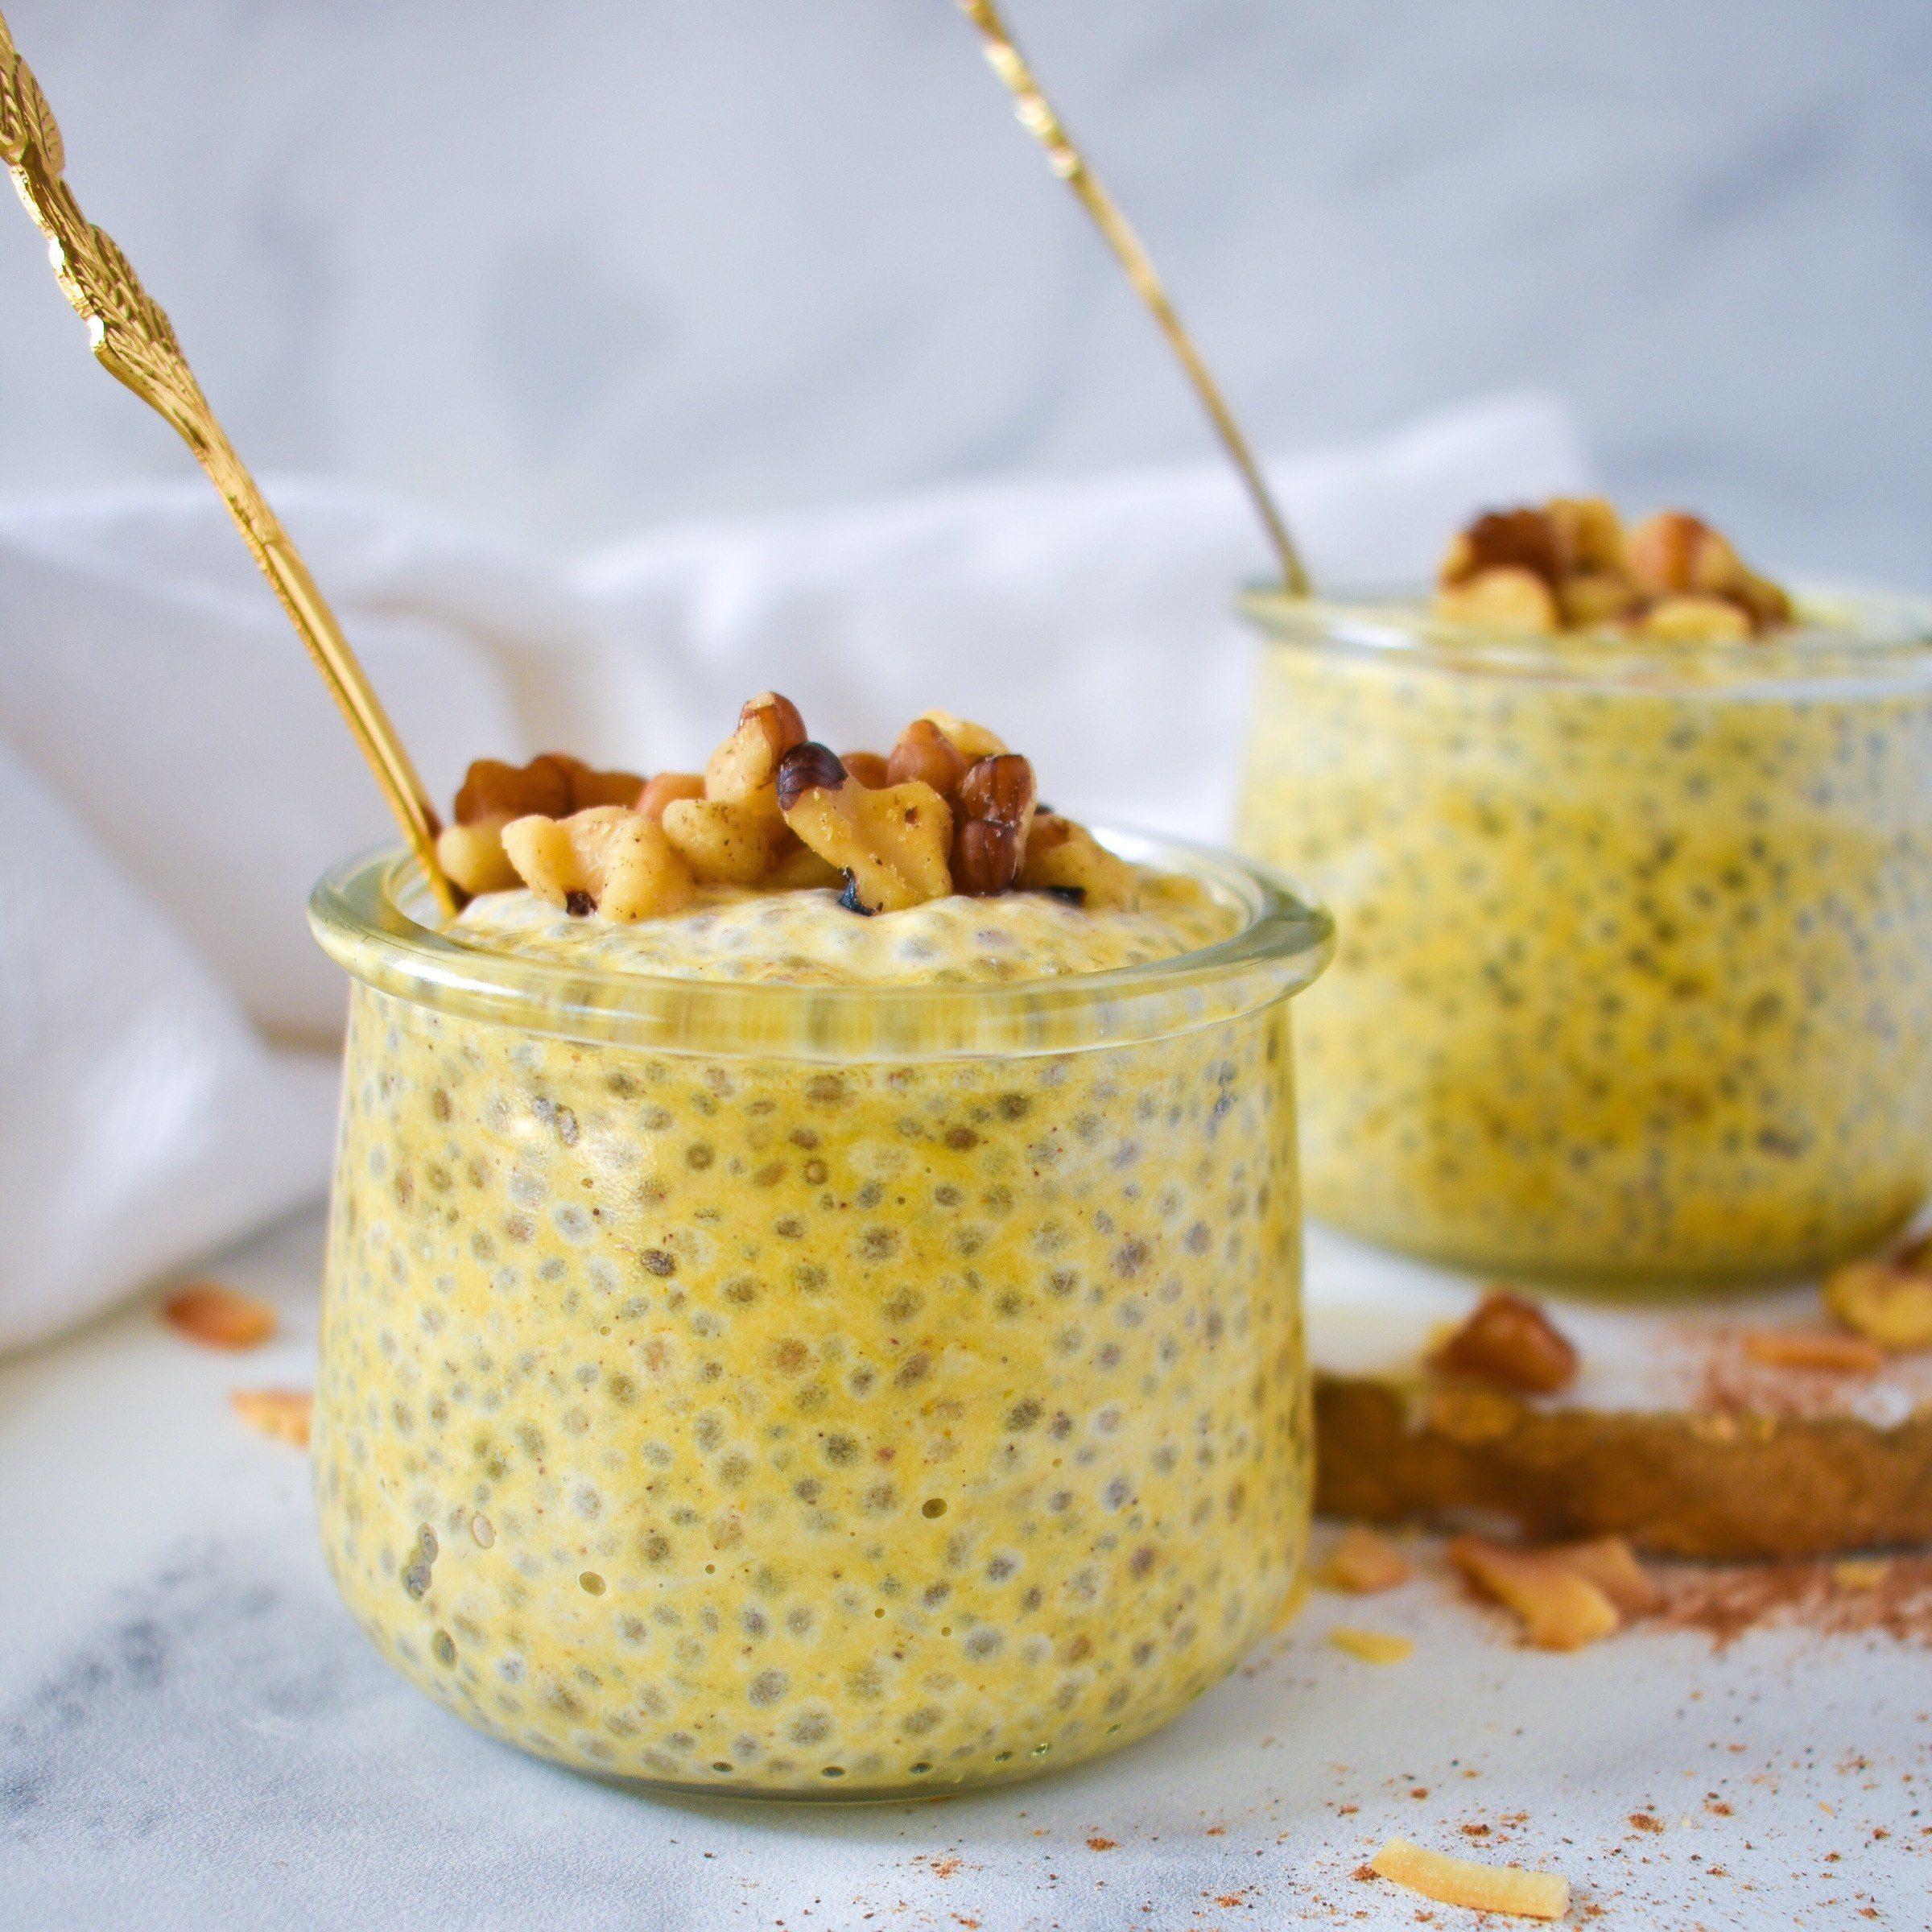 15 Bariatric Snacks You Can Prep Ahead Bariatric Meal Prep